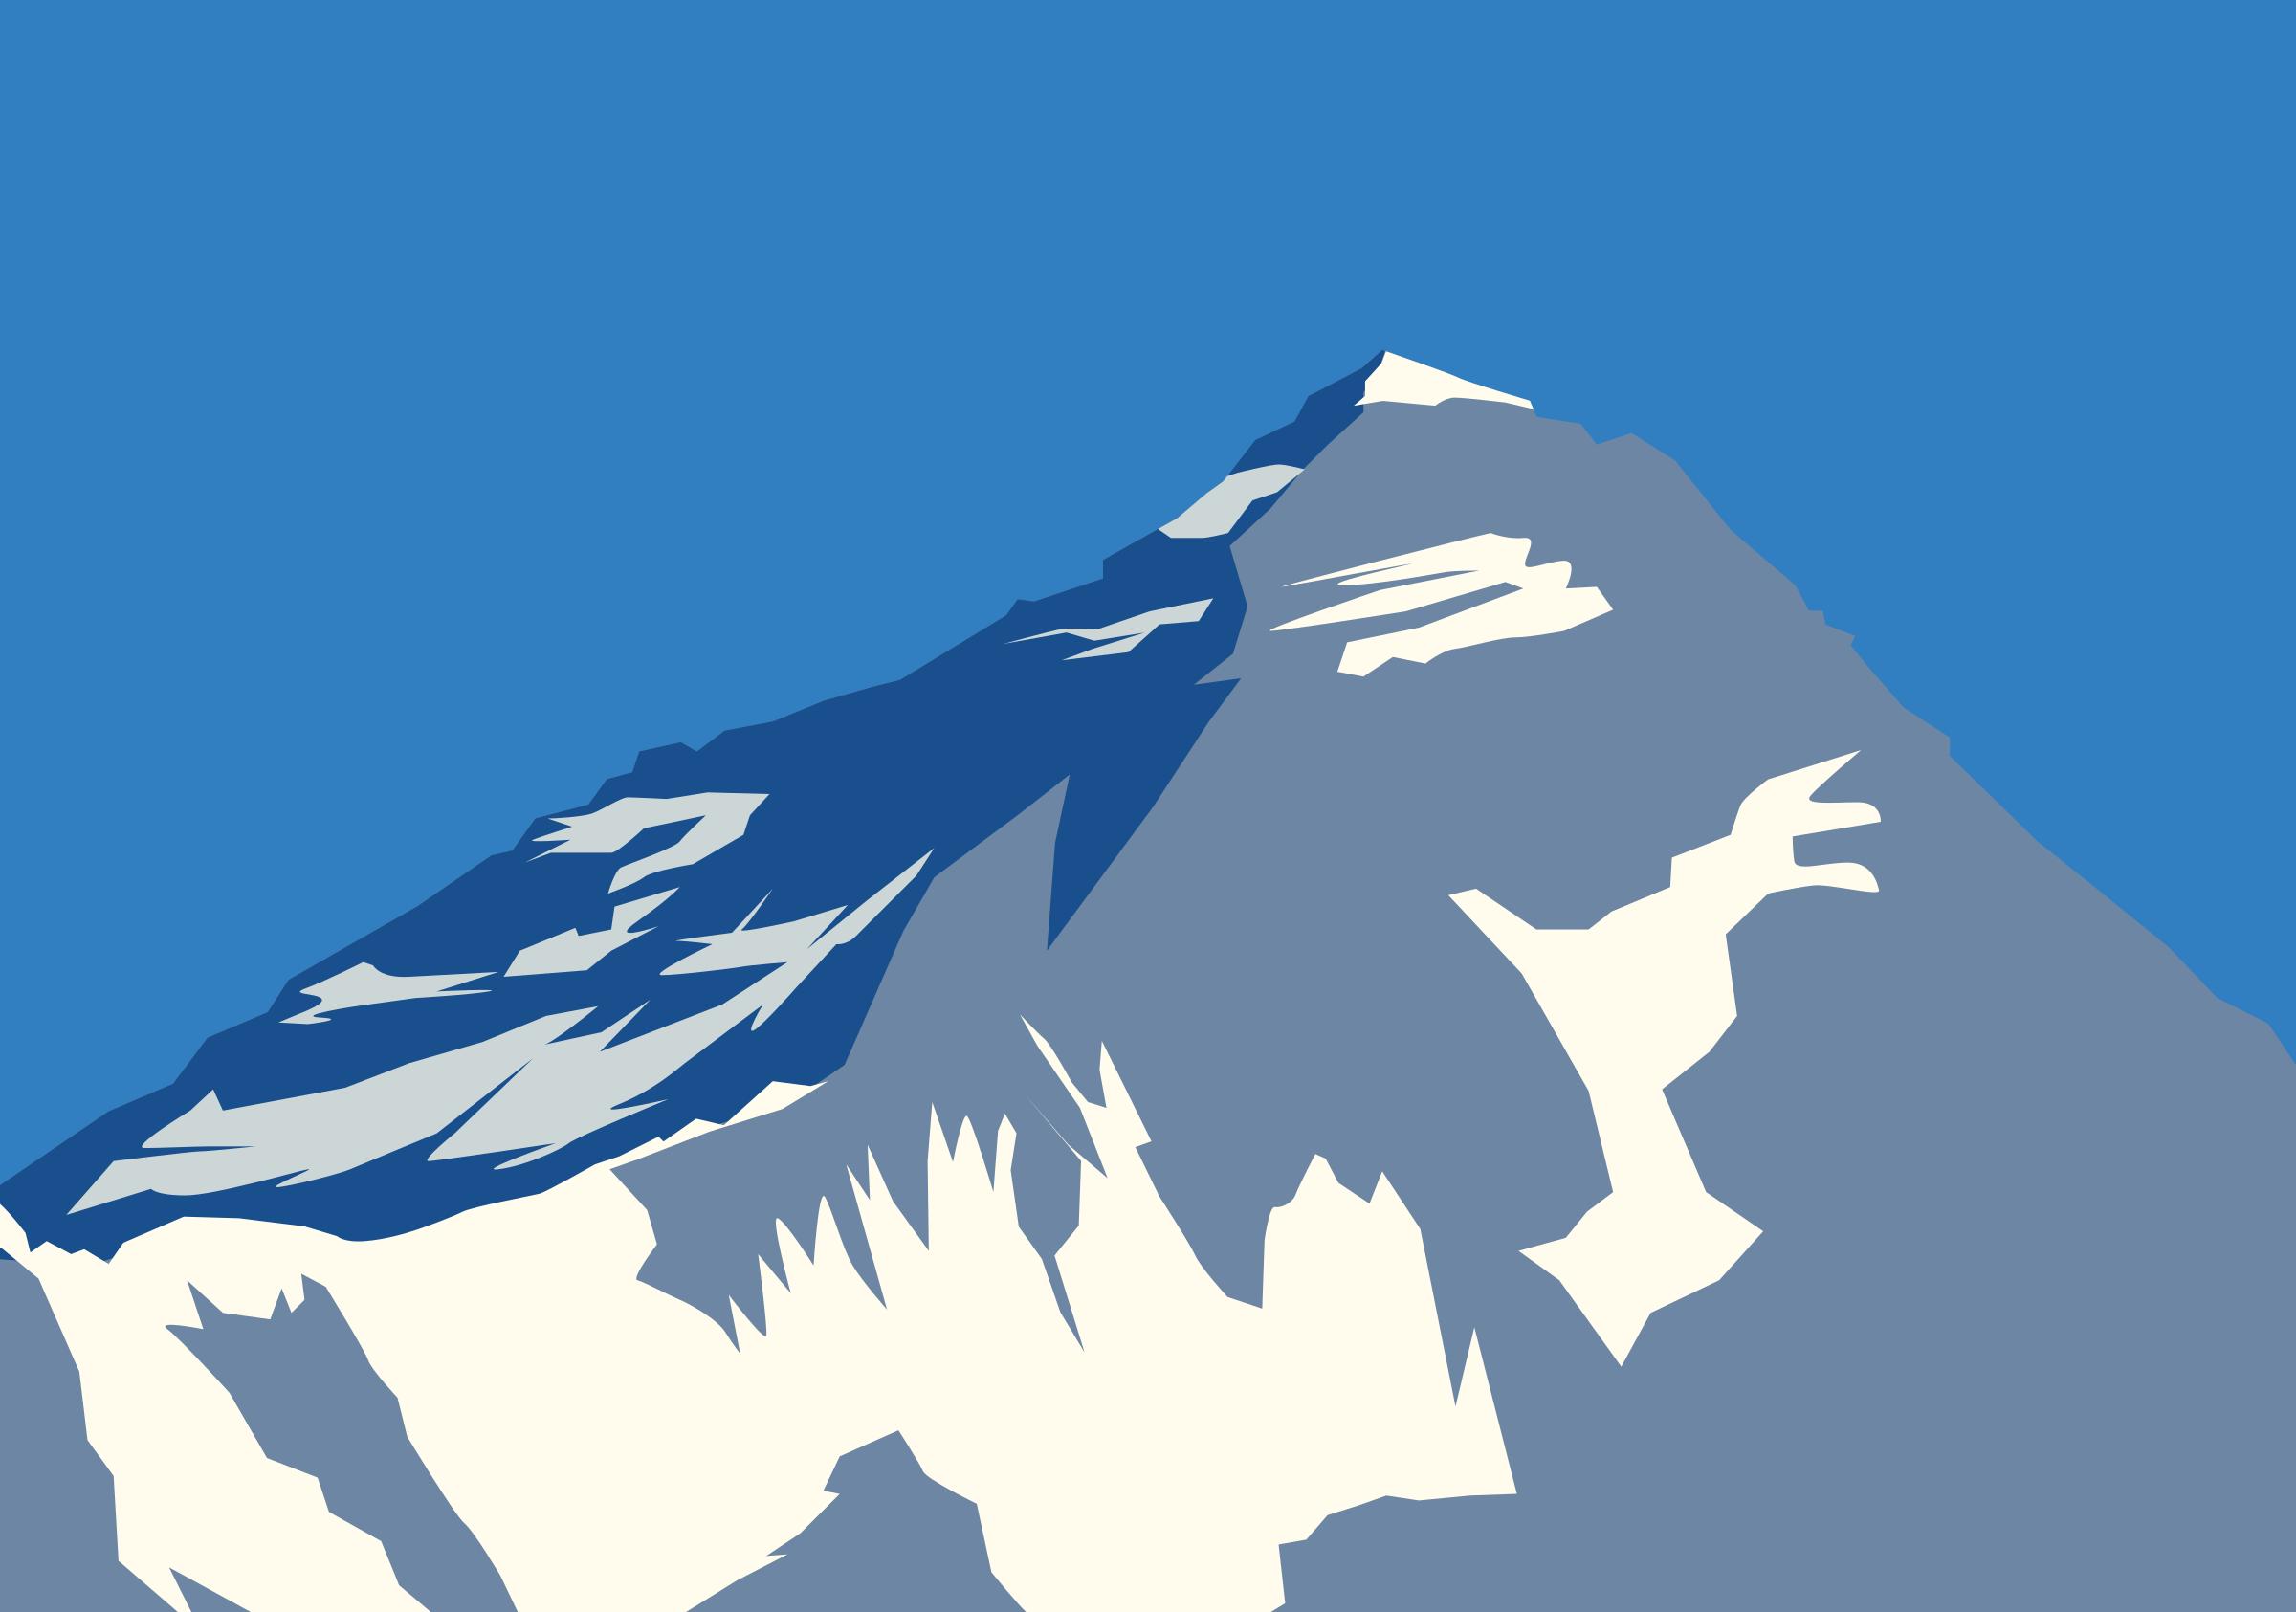 Mount clipart #13